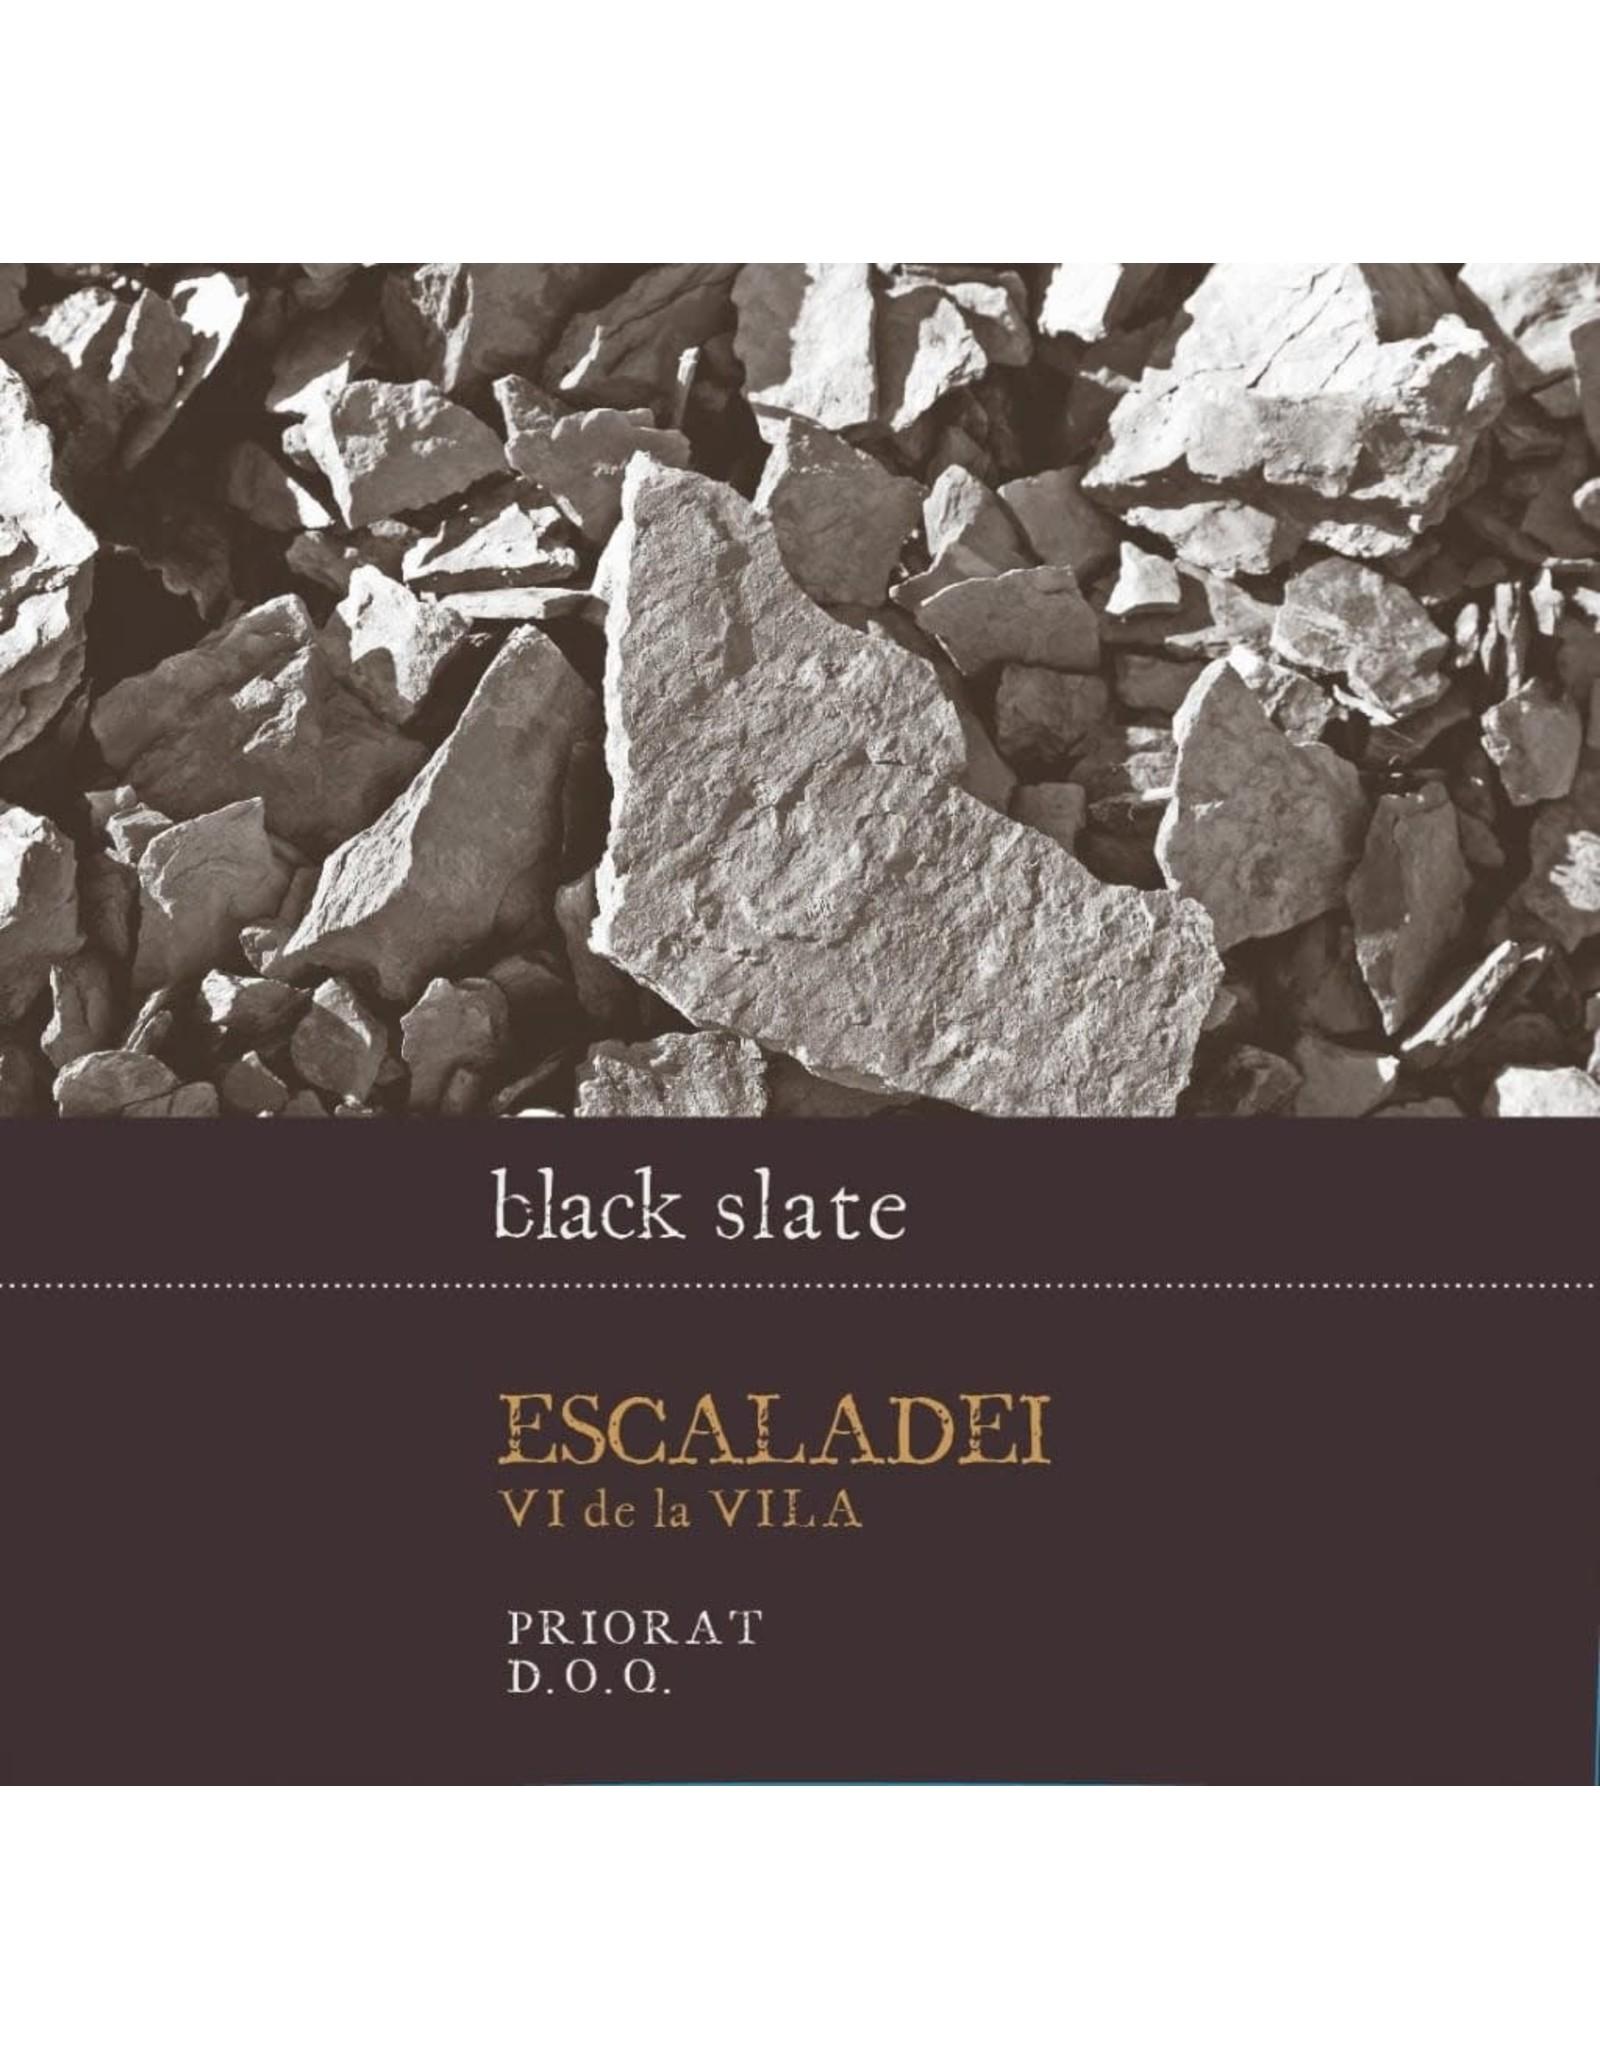 Black Slate Conreria d'Scala Dei Black Slate Escaladei 2018